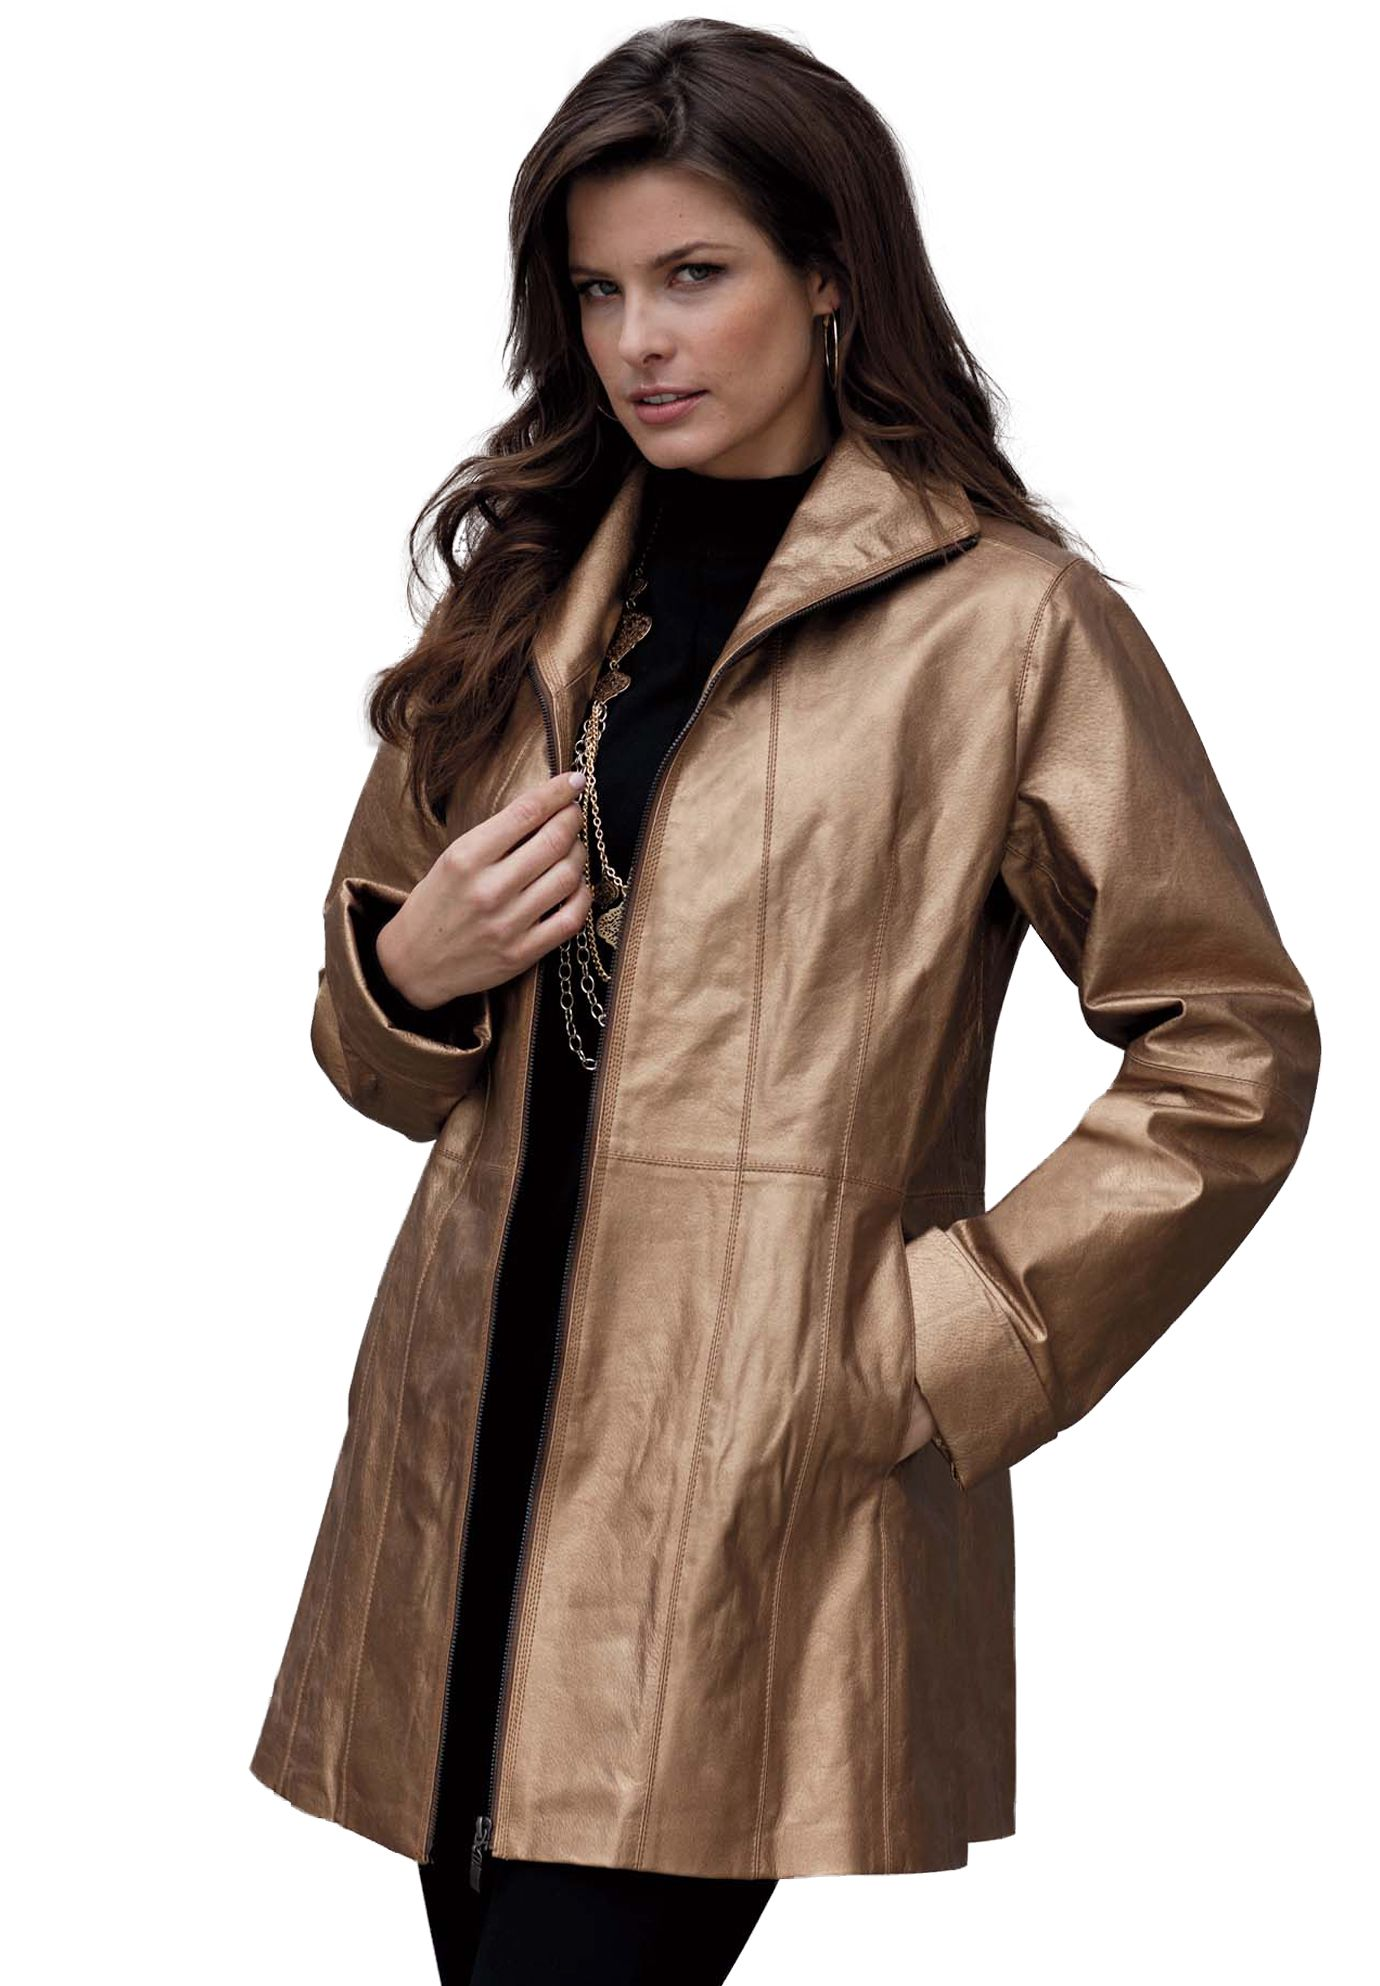 6de839519 Step out with confidence this season in Roaman s plus size Leather A-line  Jacket!  coats  roamans  plussize